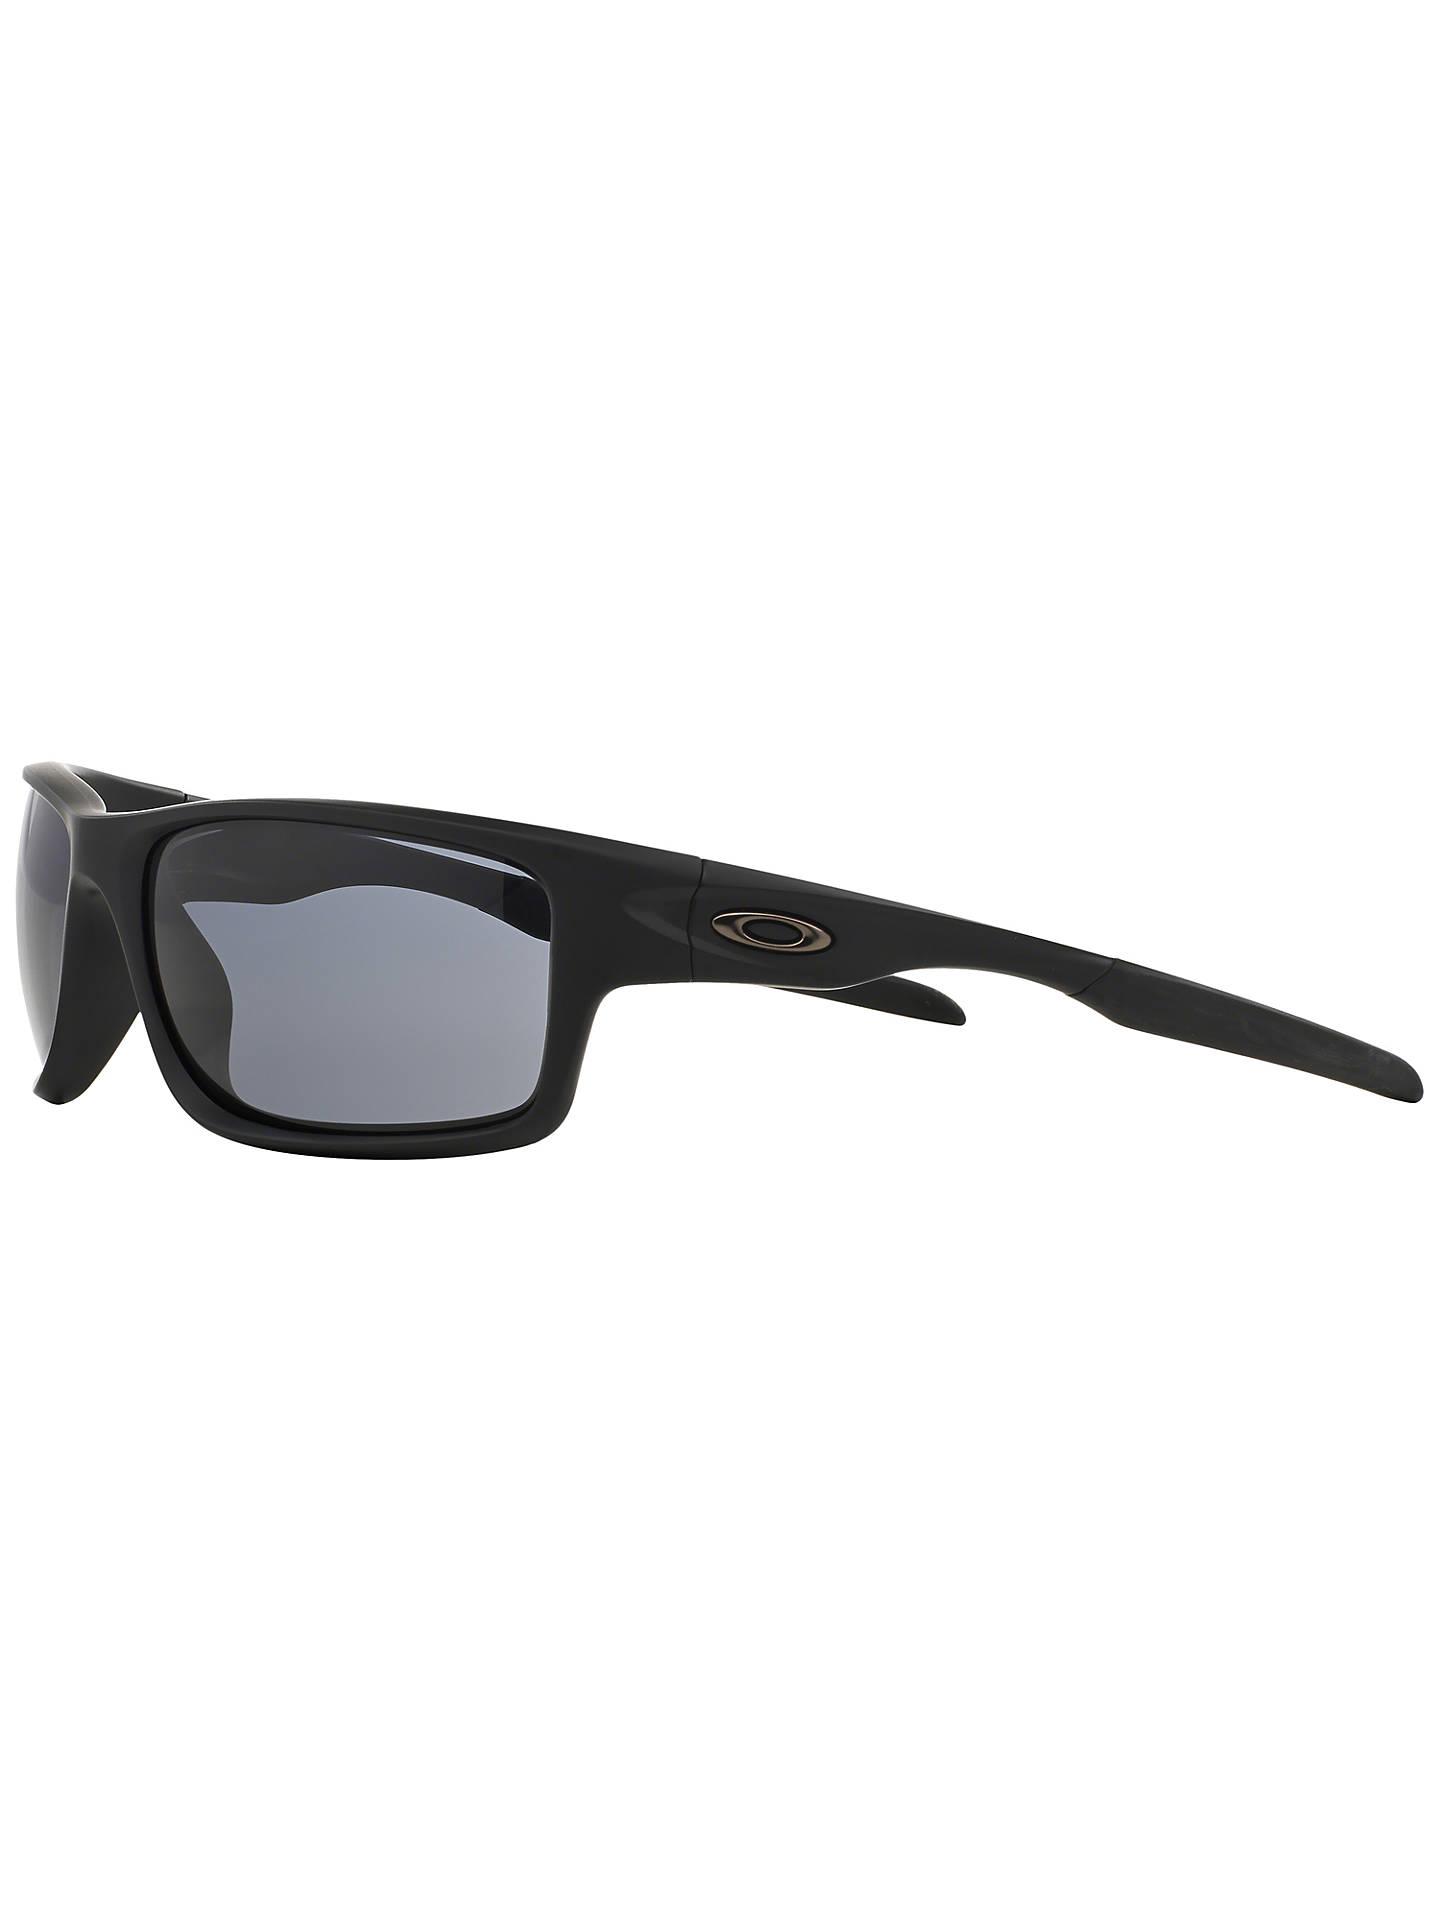 84980471351 ... BuyOakley OO9225 Canteen Sunglasses